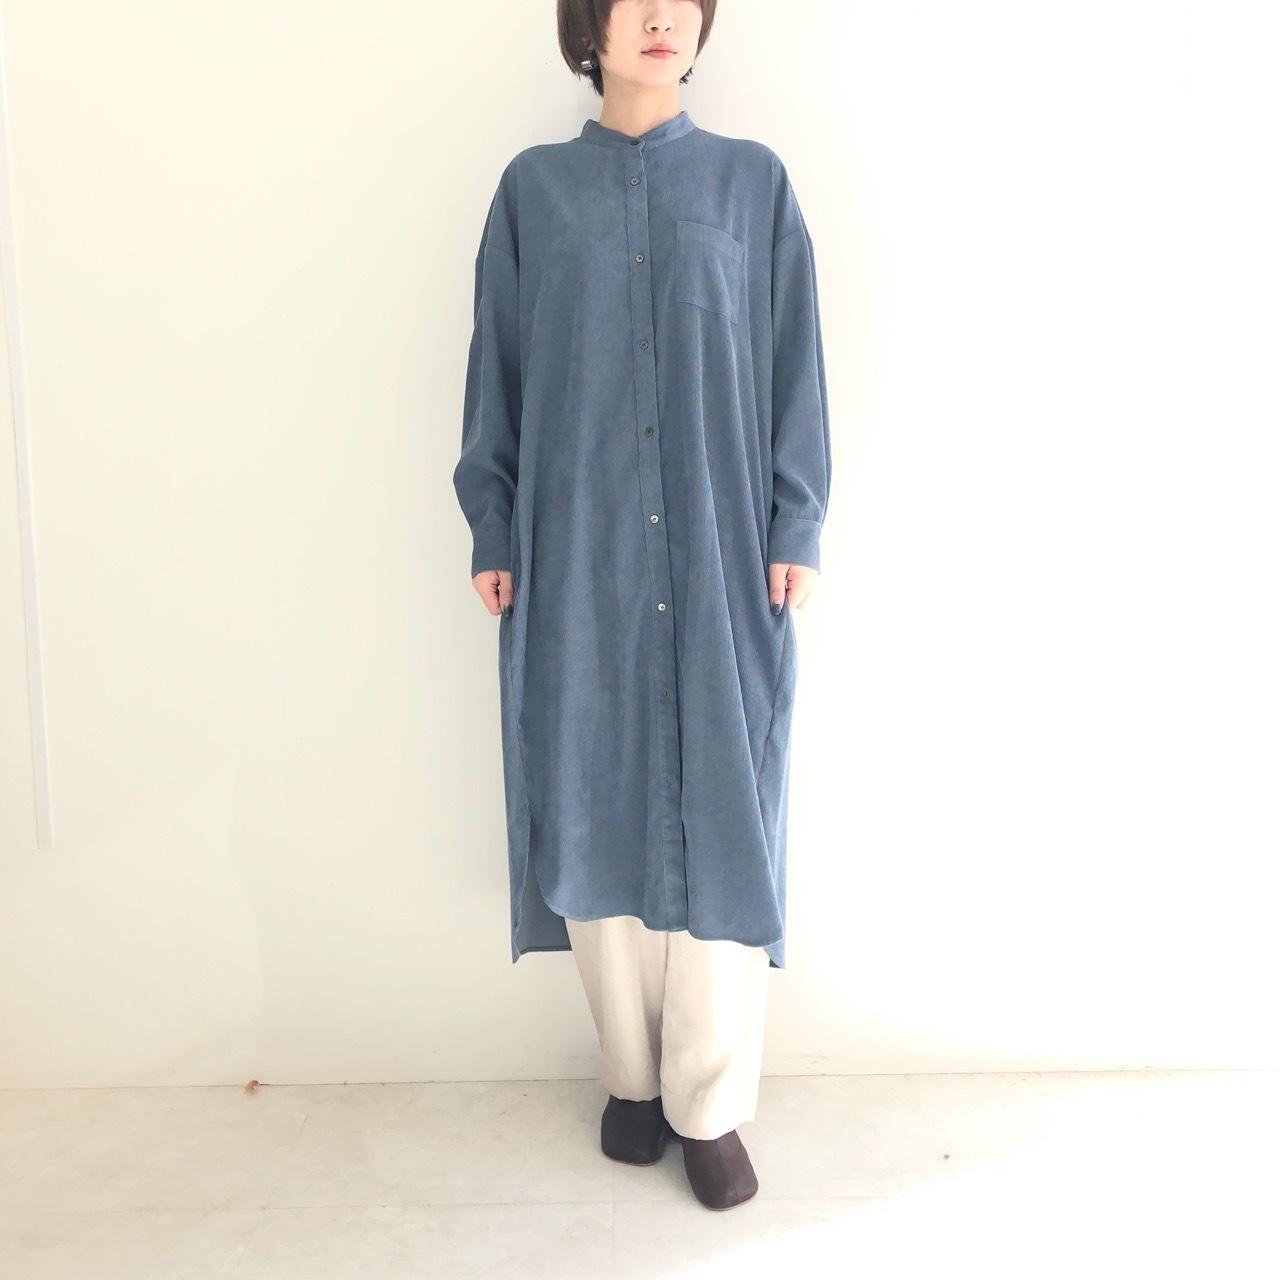 【 CHIGNONSTAR 】- 5692-443 - コールバックタックSHOP